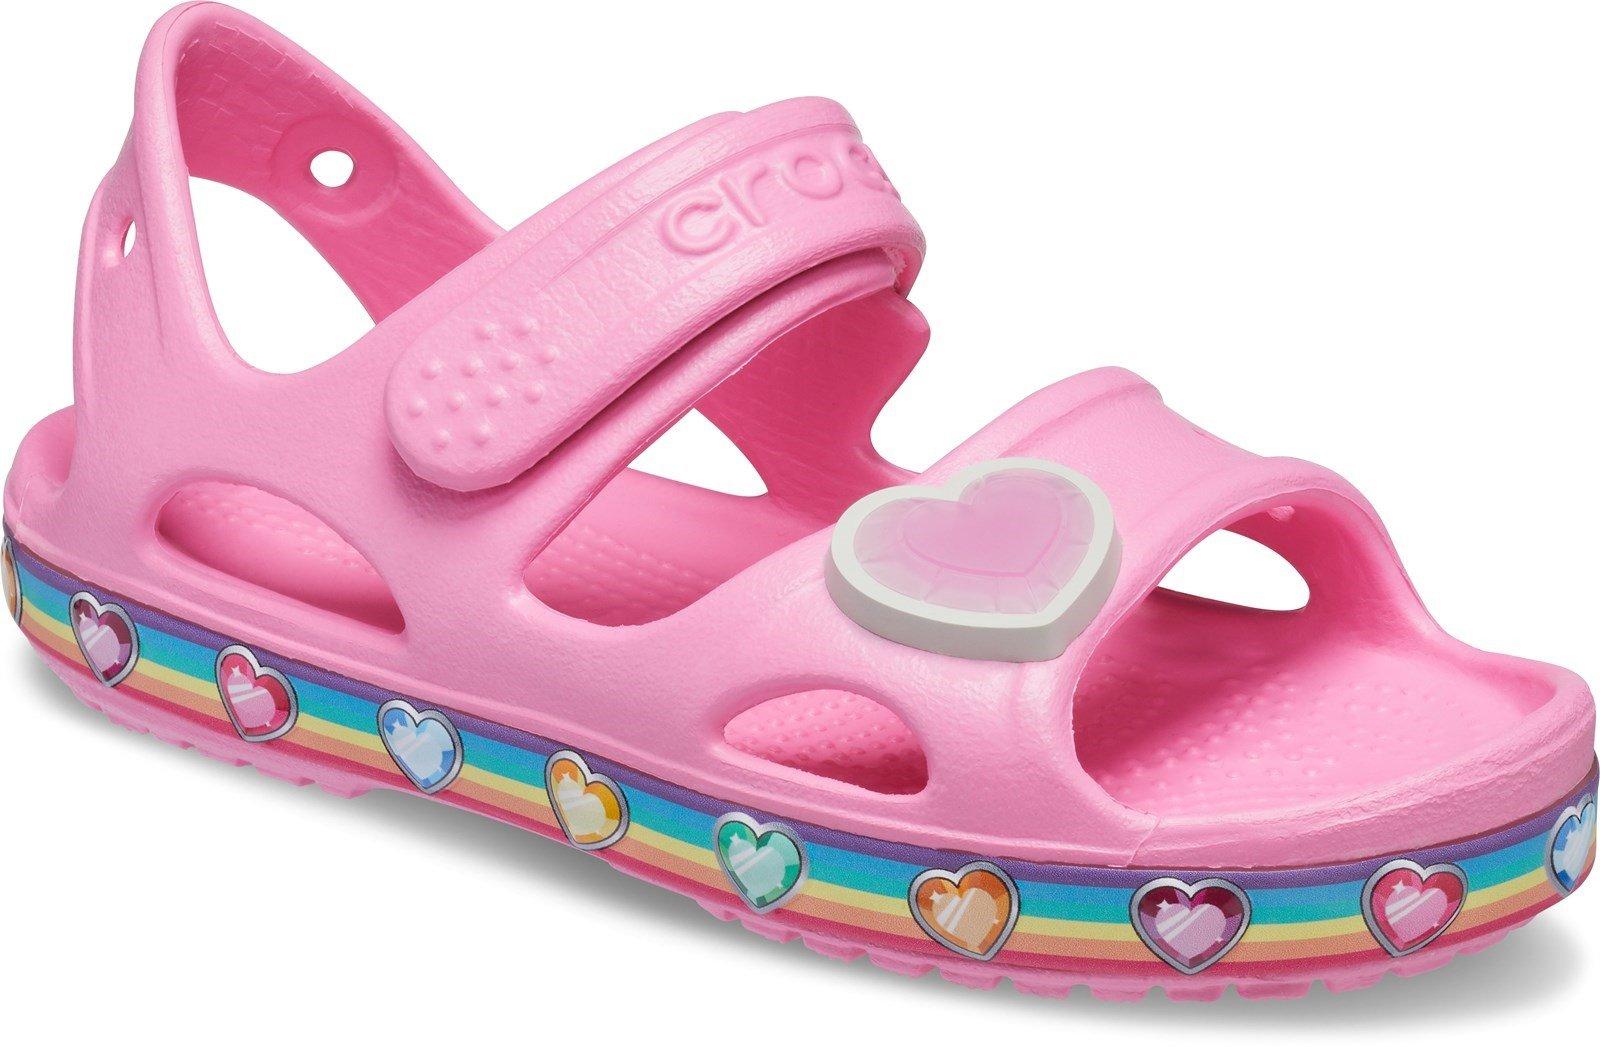 Crocs Kid's Fun Lab Rainbow Sandal Pink Lemonade 31881 - Pink Lemonade 4